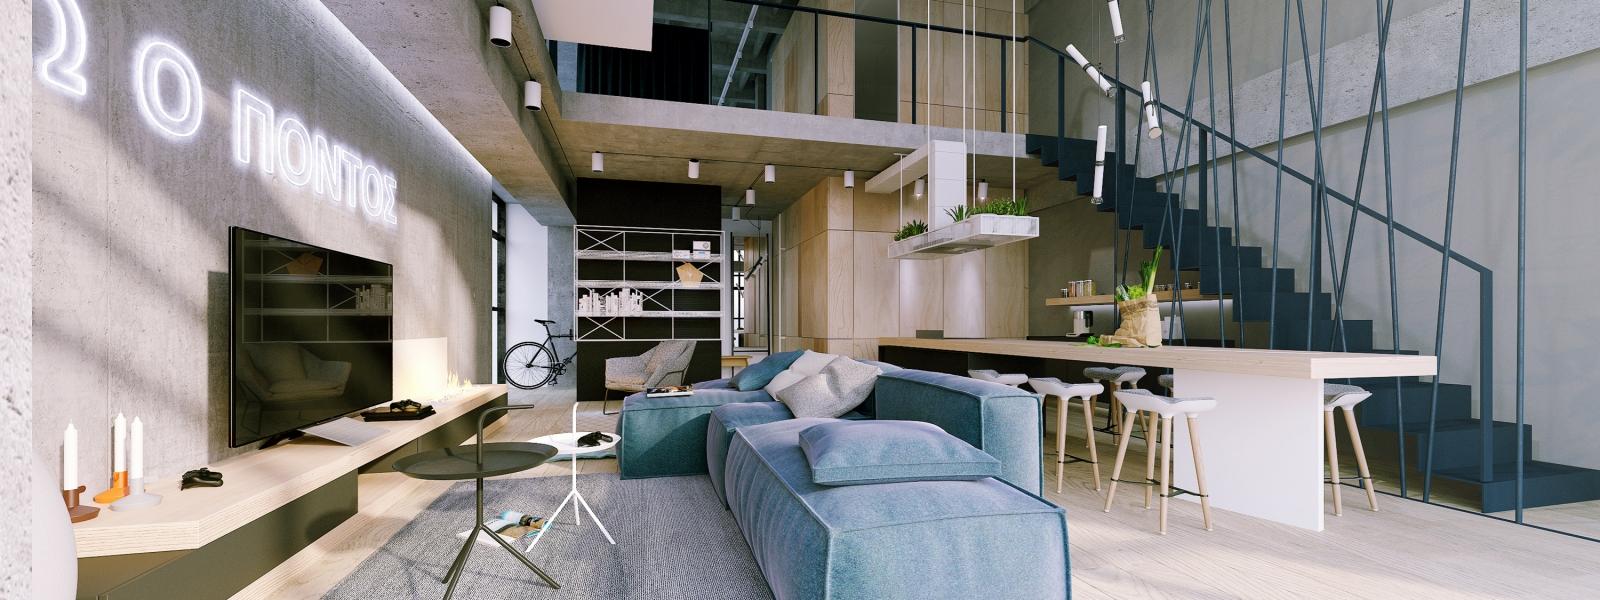 work-S39 apartment